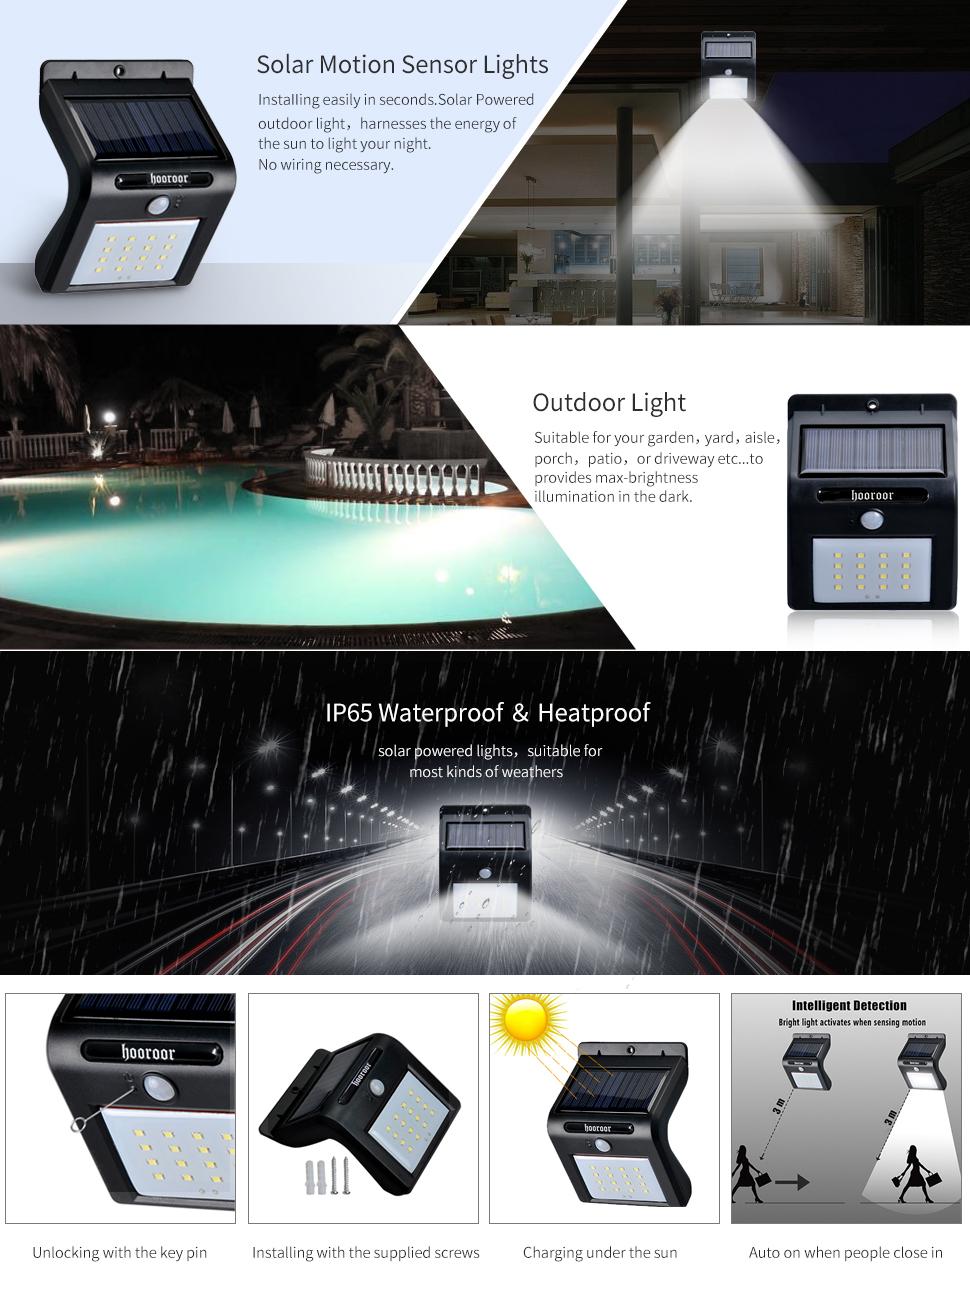 16 LED 6500K Wireless Waterproof Motion Sensor Outdoor Solar Lights For  Patio, Deck, Yard, Garden, Porch, Driveway, Etc.